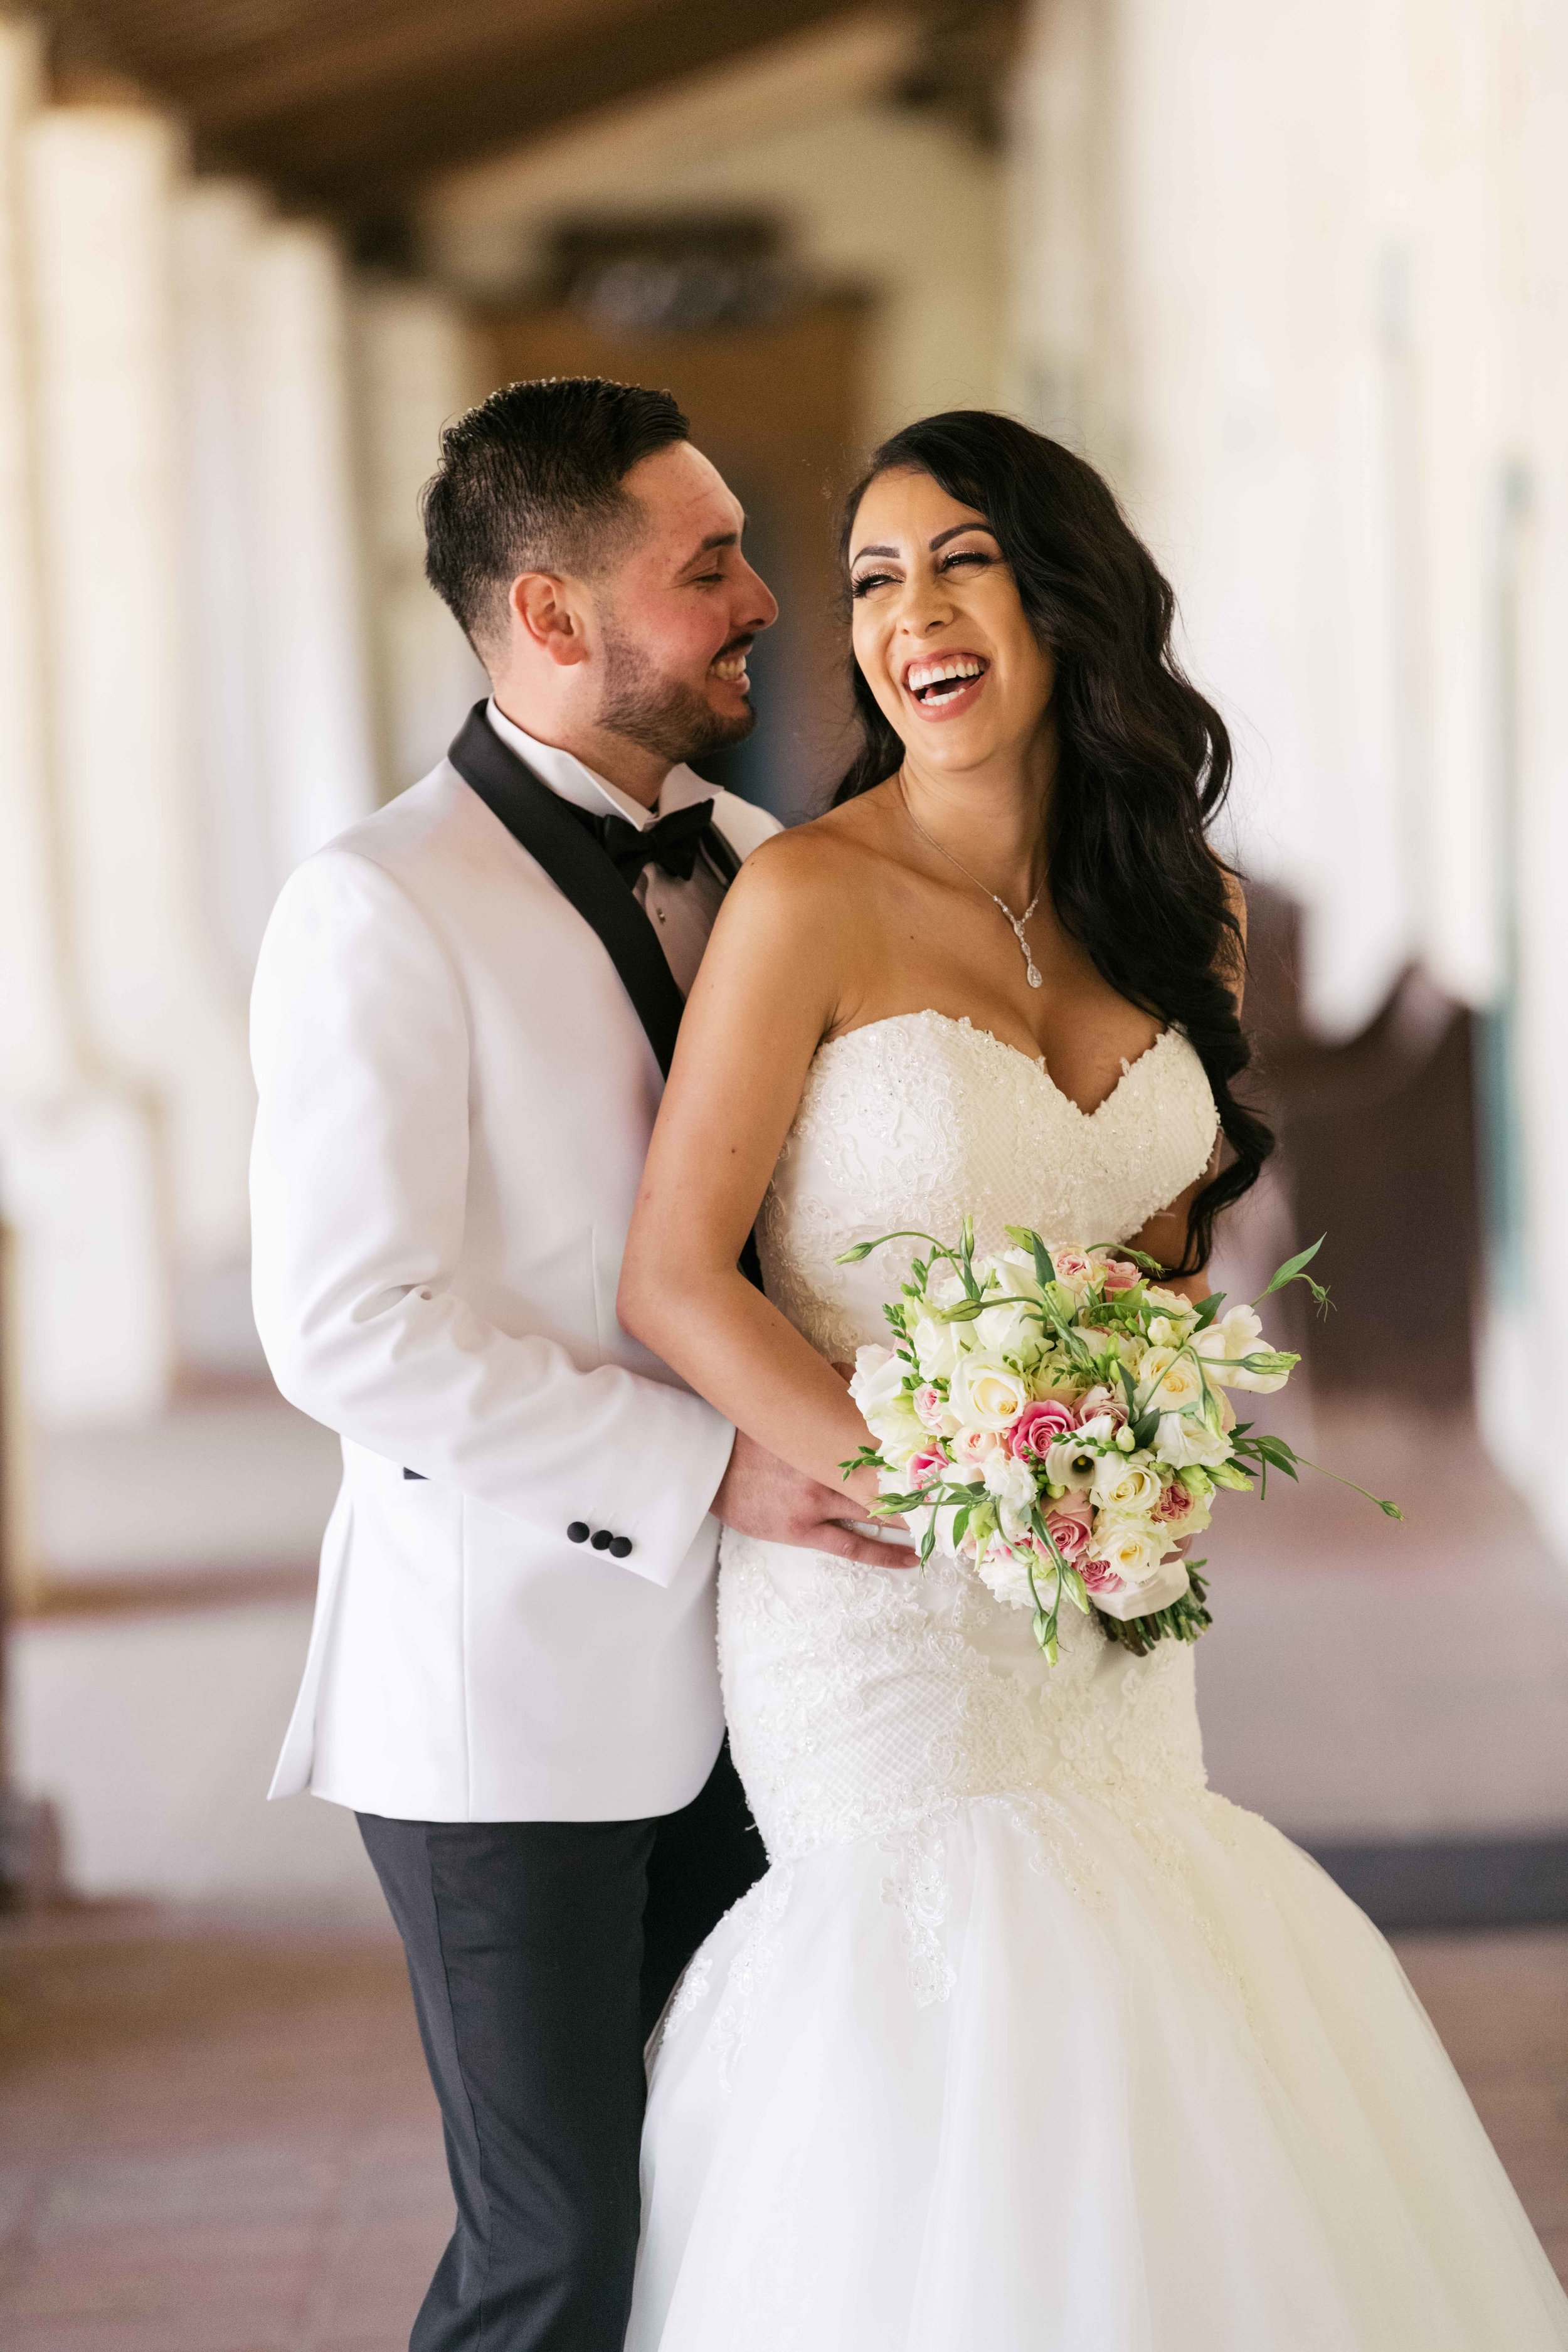 san-juan-bautista-photographer-tony-monse-wedding-383.JPG